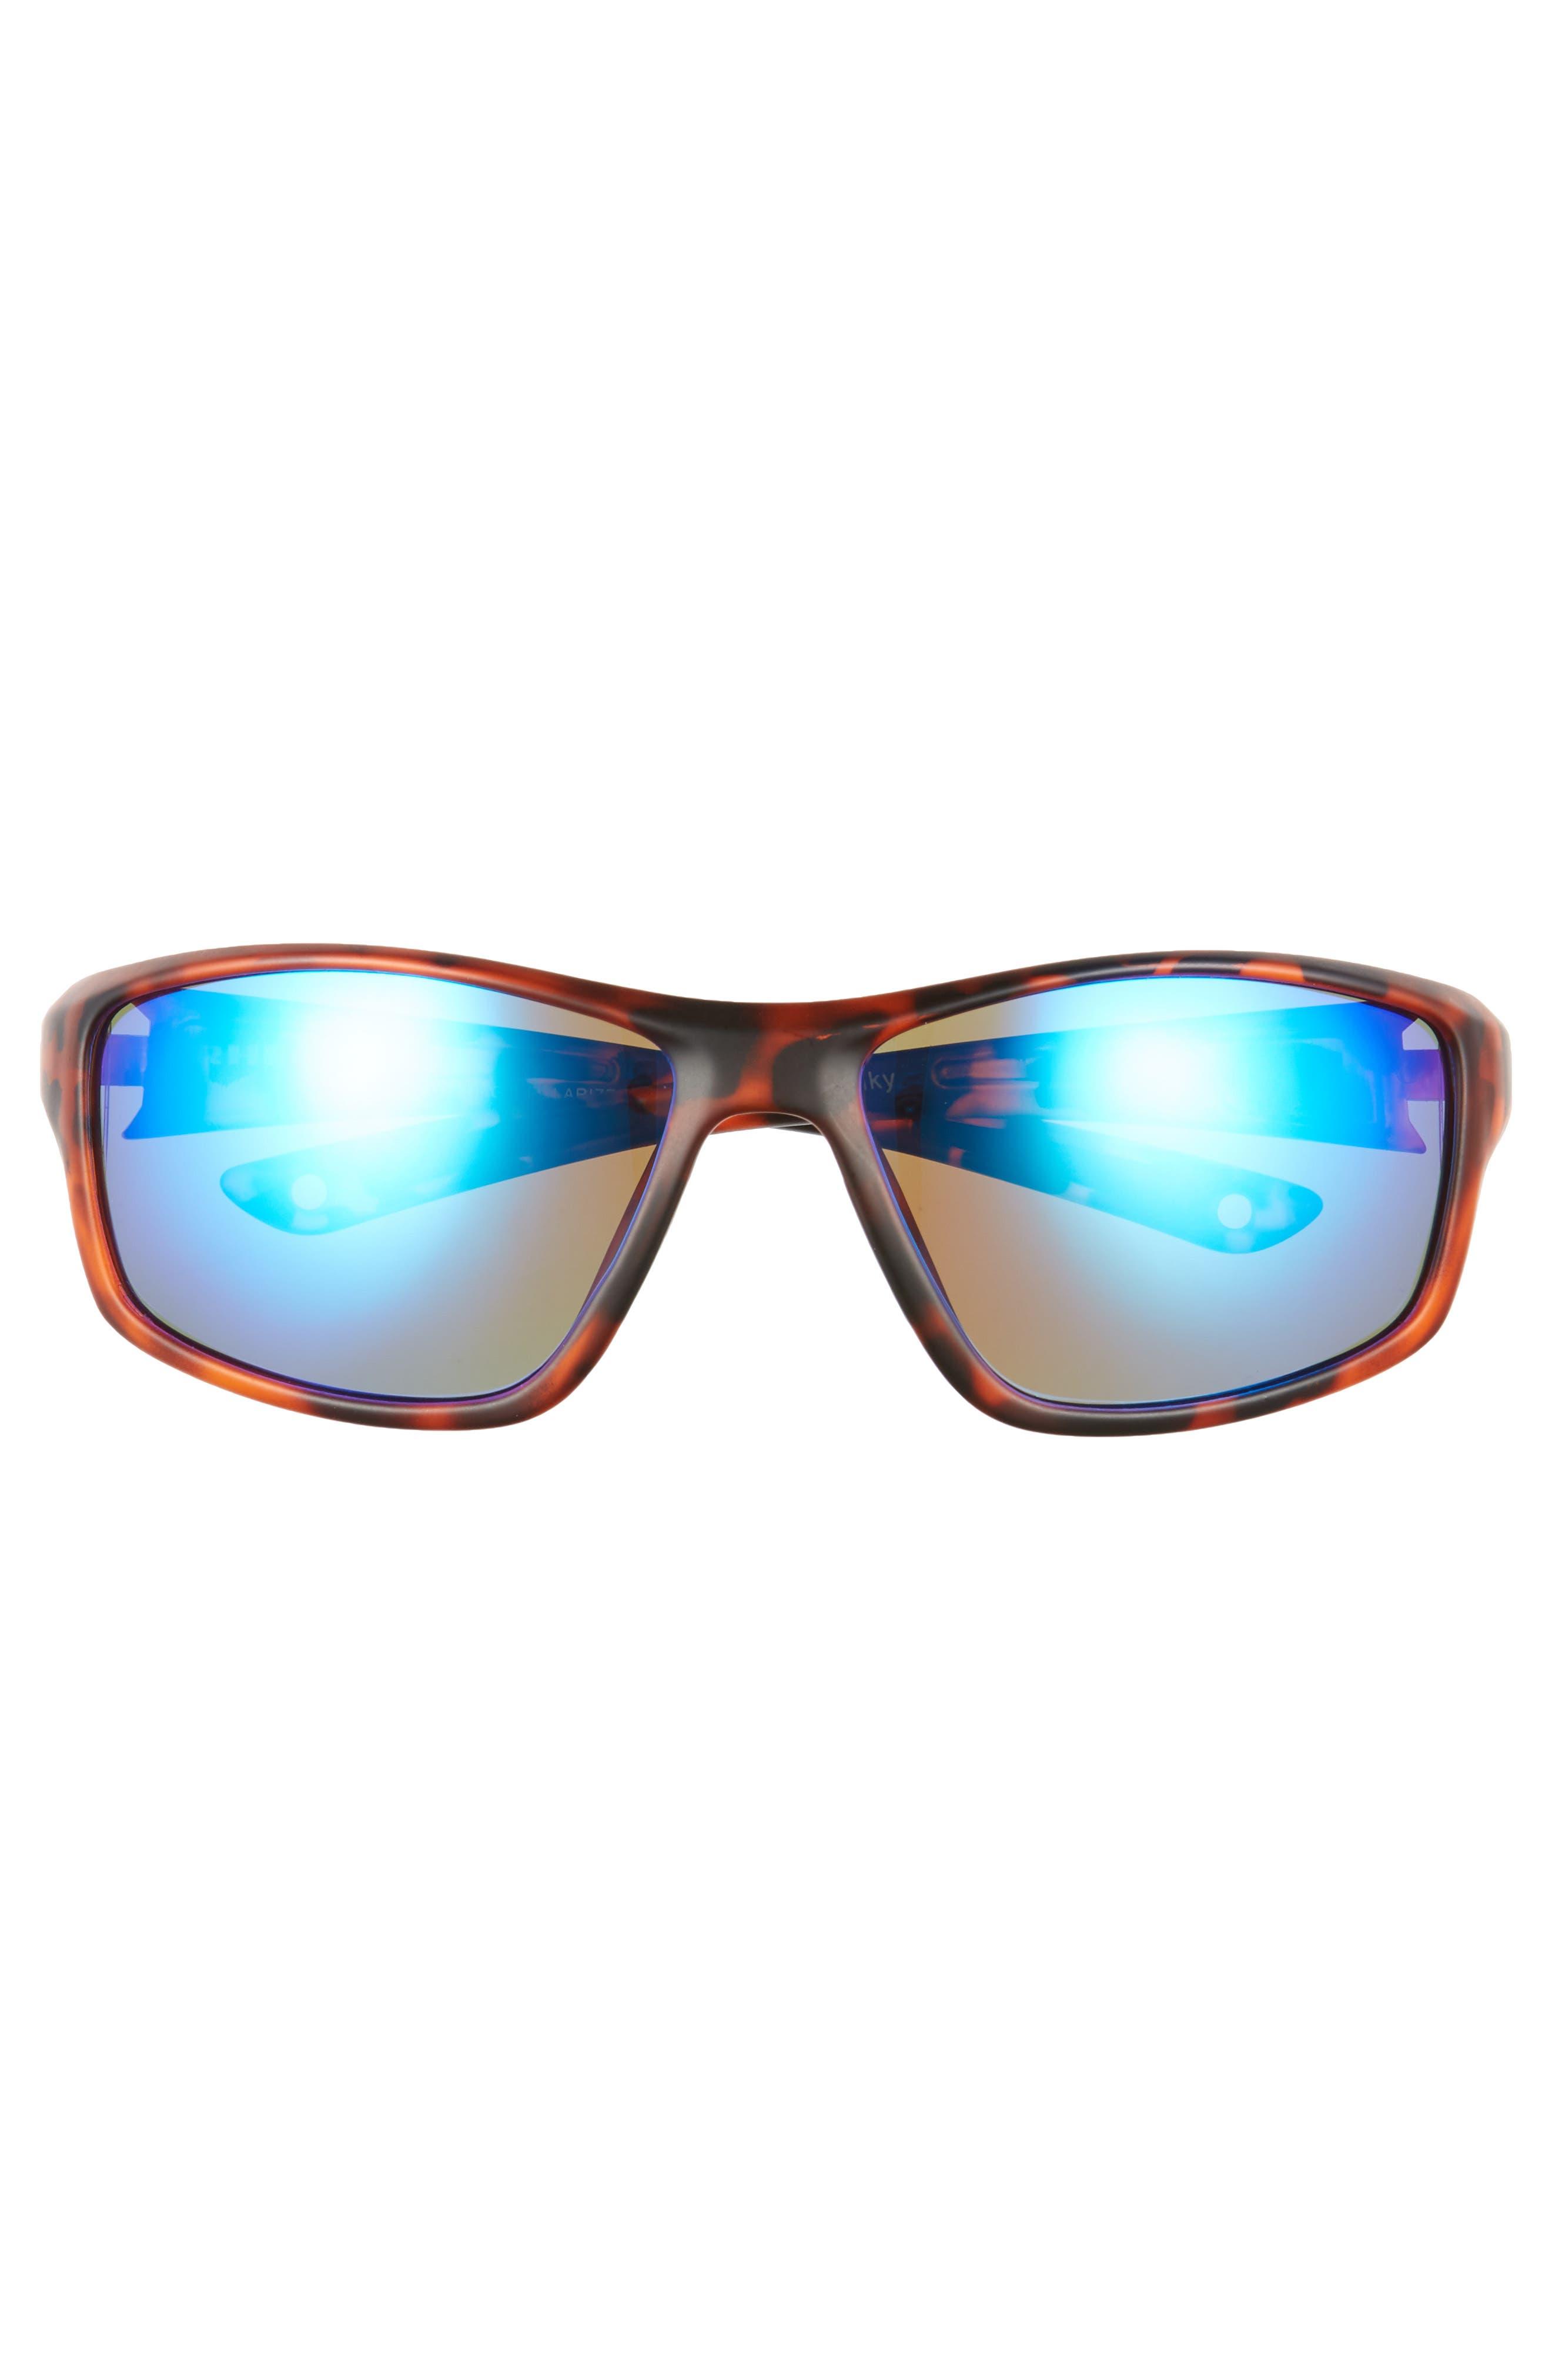 Eddies Floating 58mm Polarized Sunglasses,                             Alternate thumbnail 4, color,